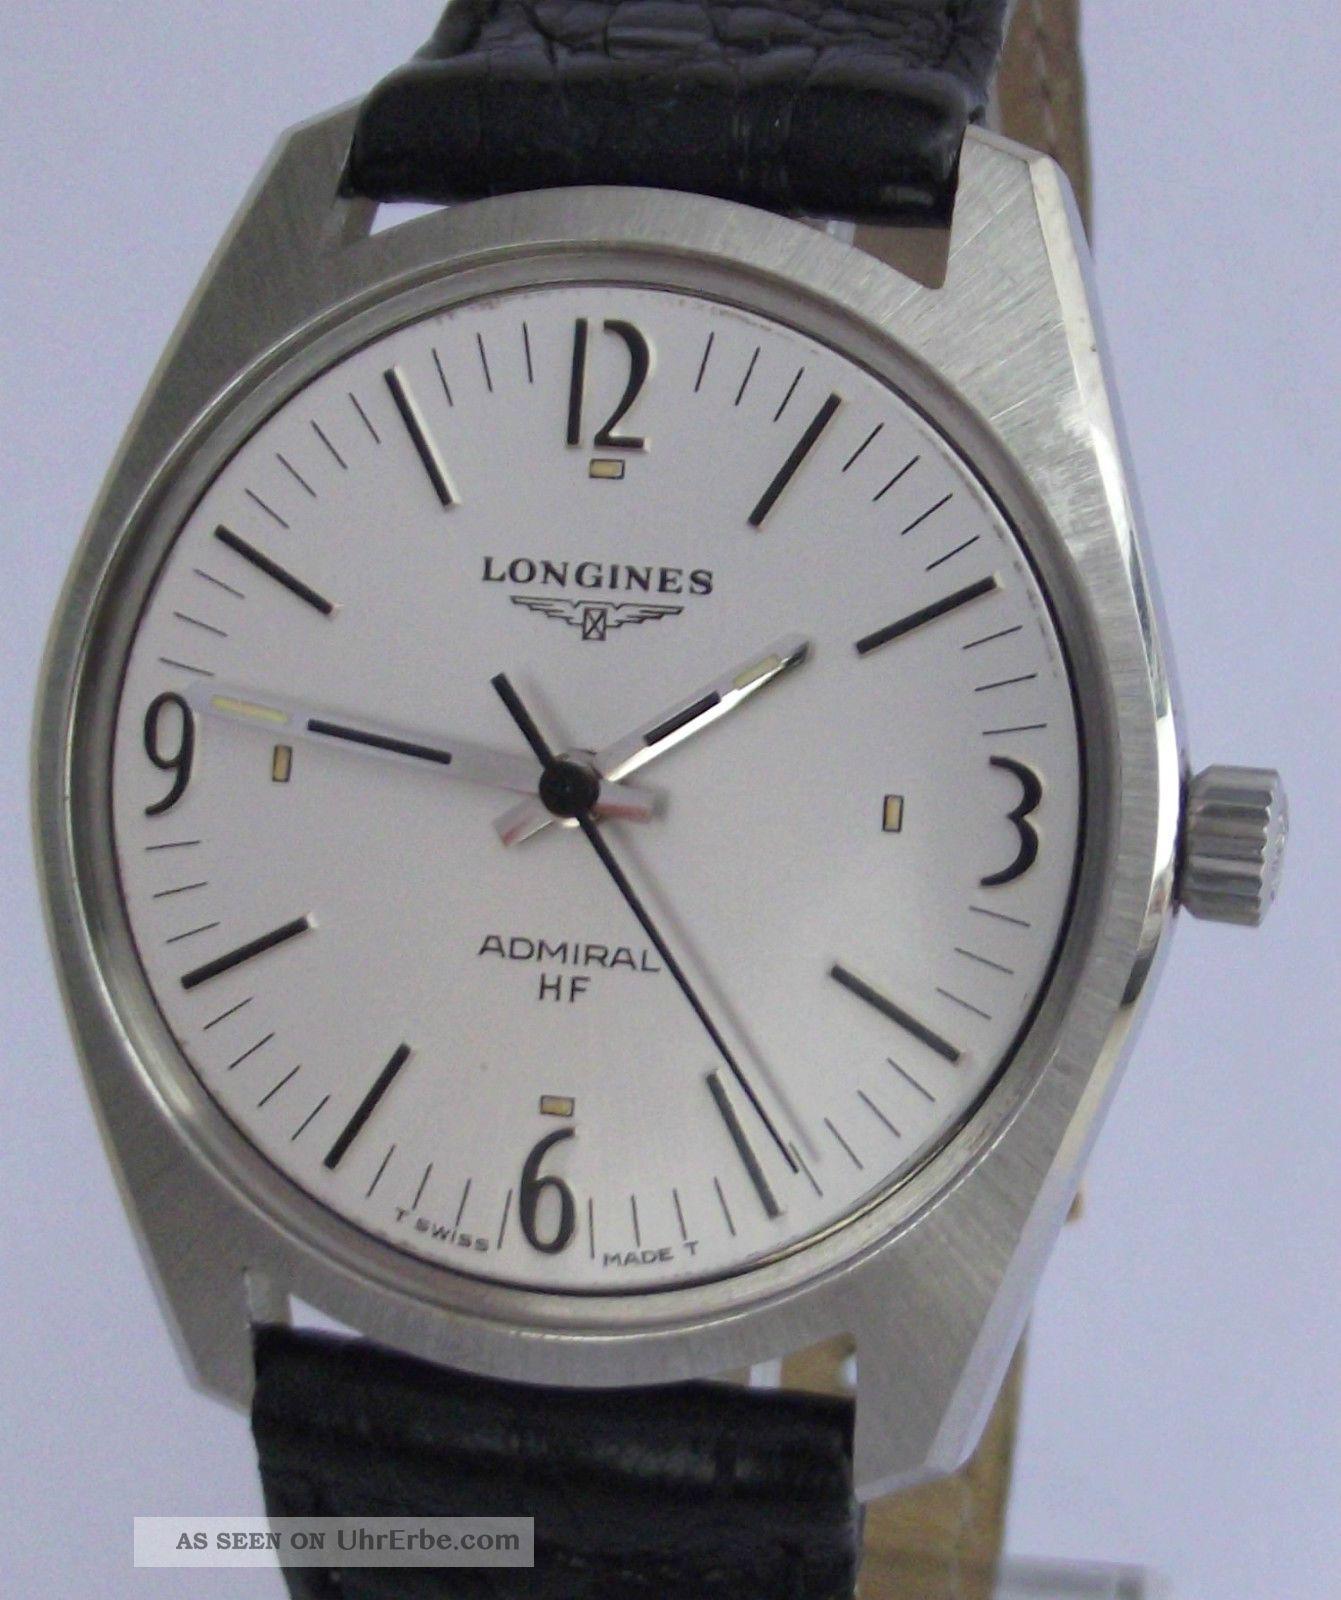 Hau Longines Admiral Hf,  Cal.  Longines 6942,  Um 1970 Armbanduhren Bild